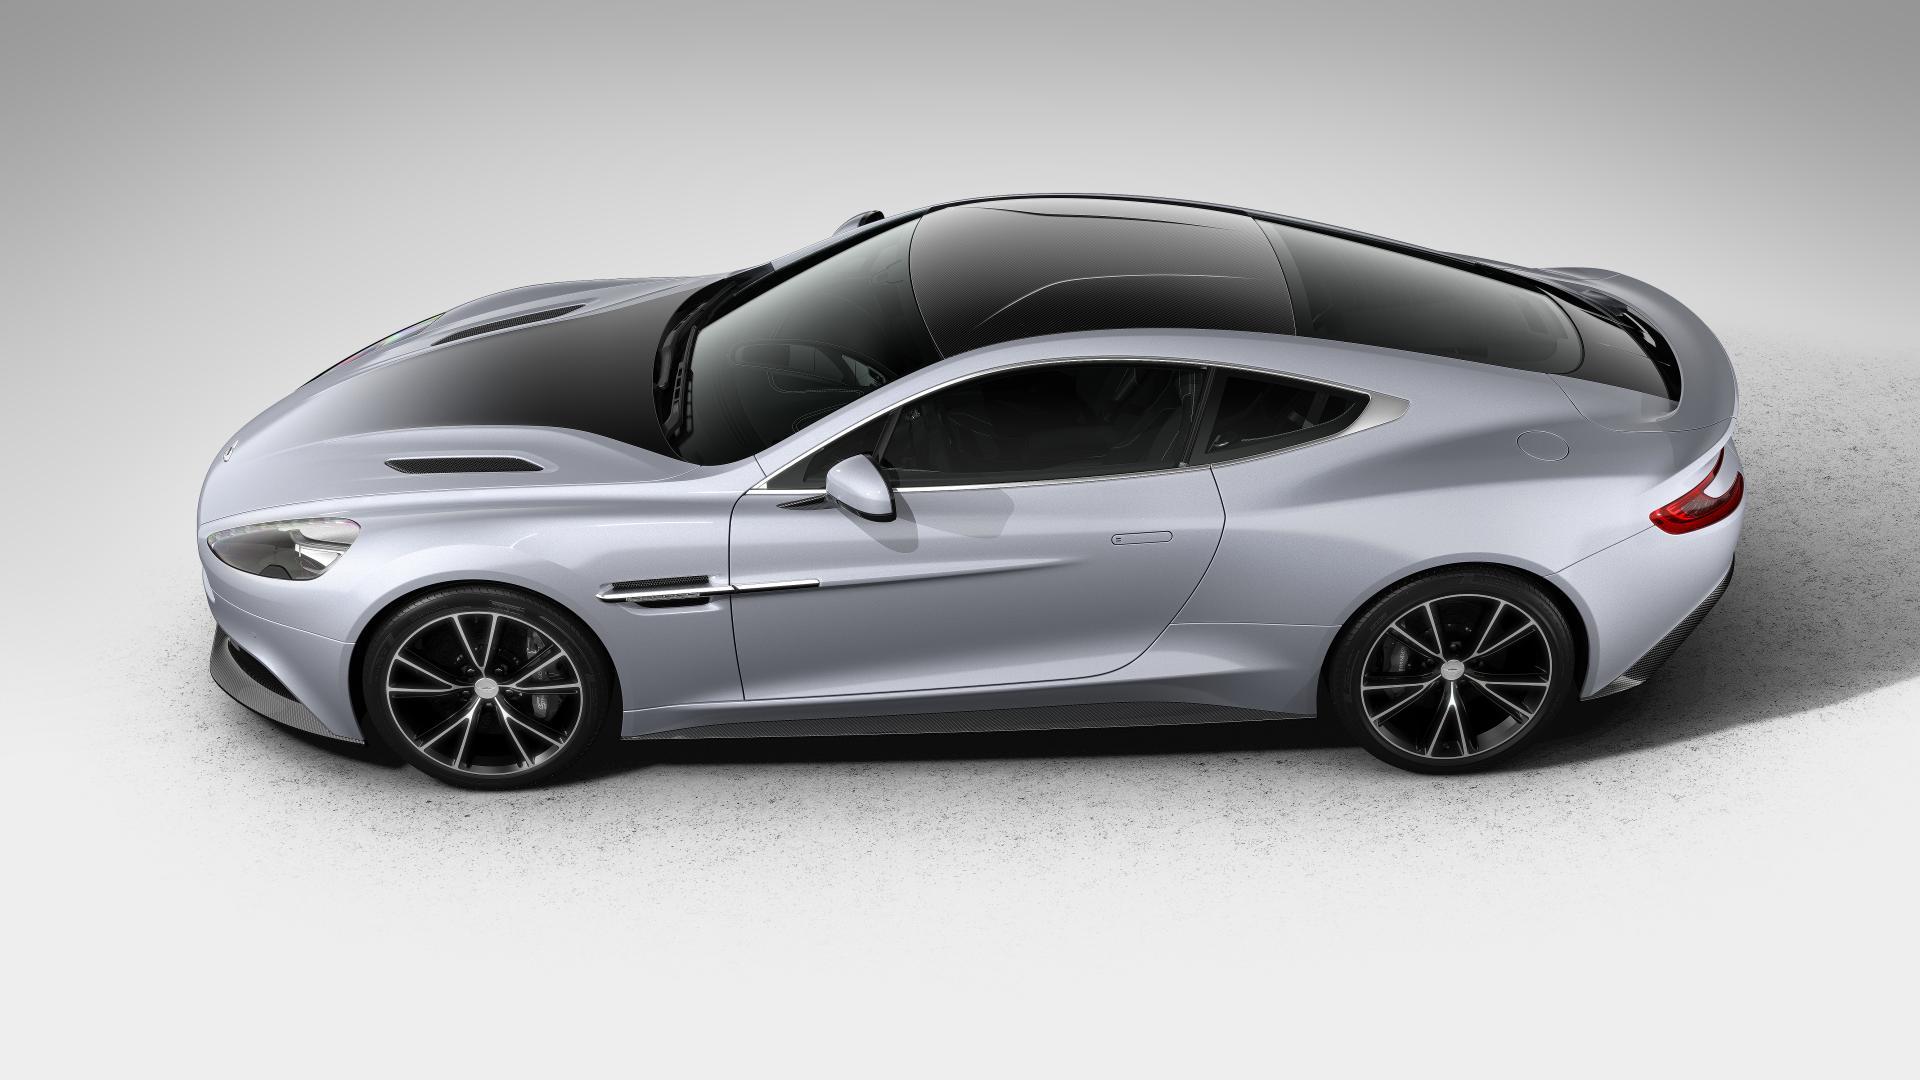 2013 Aston Martin Vanquish Centenary Edition News And Information